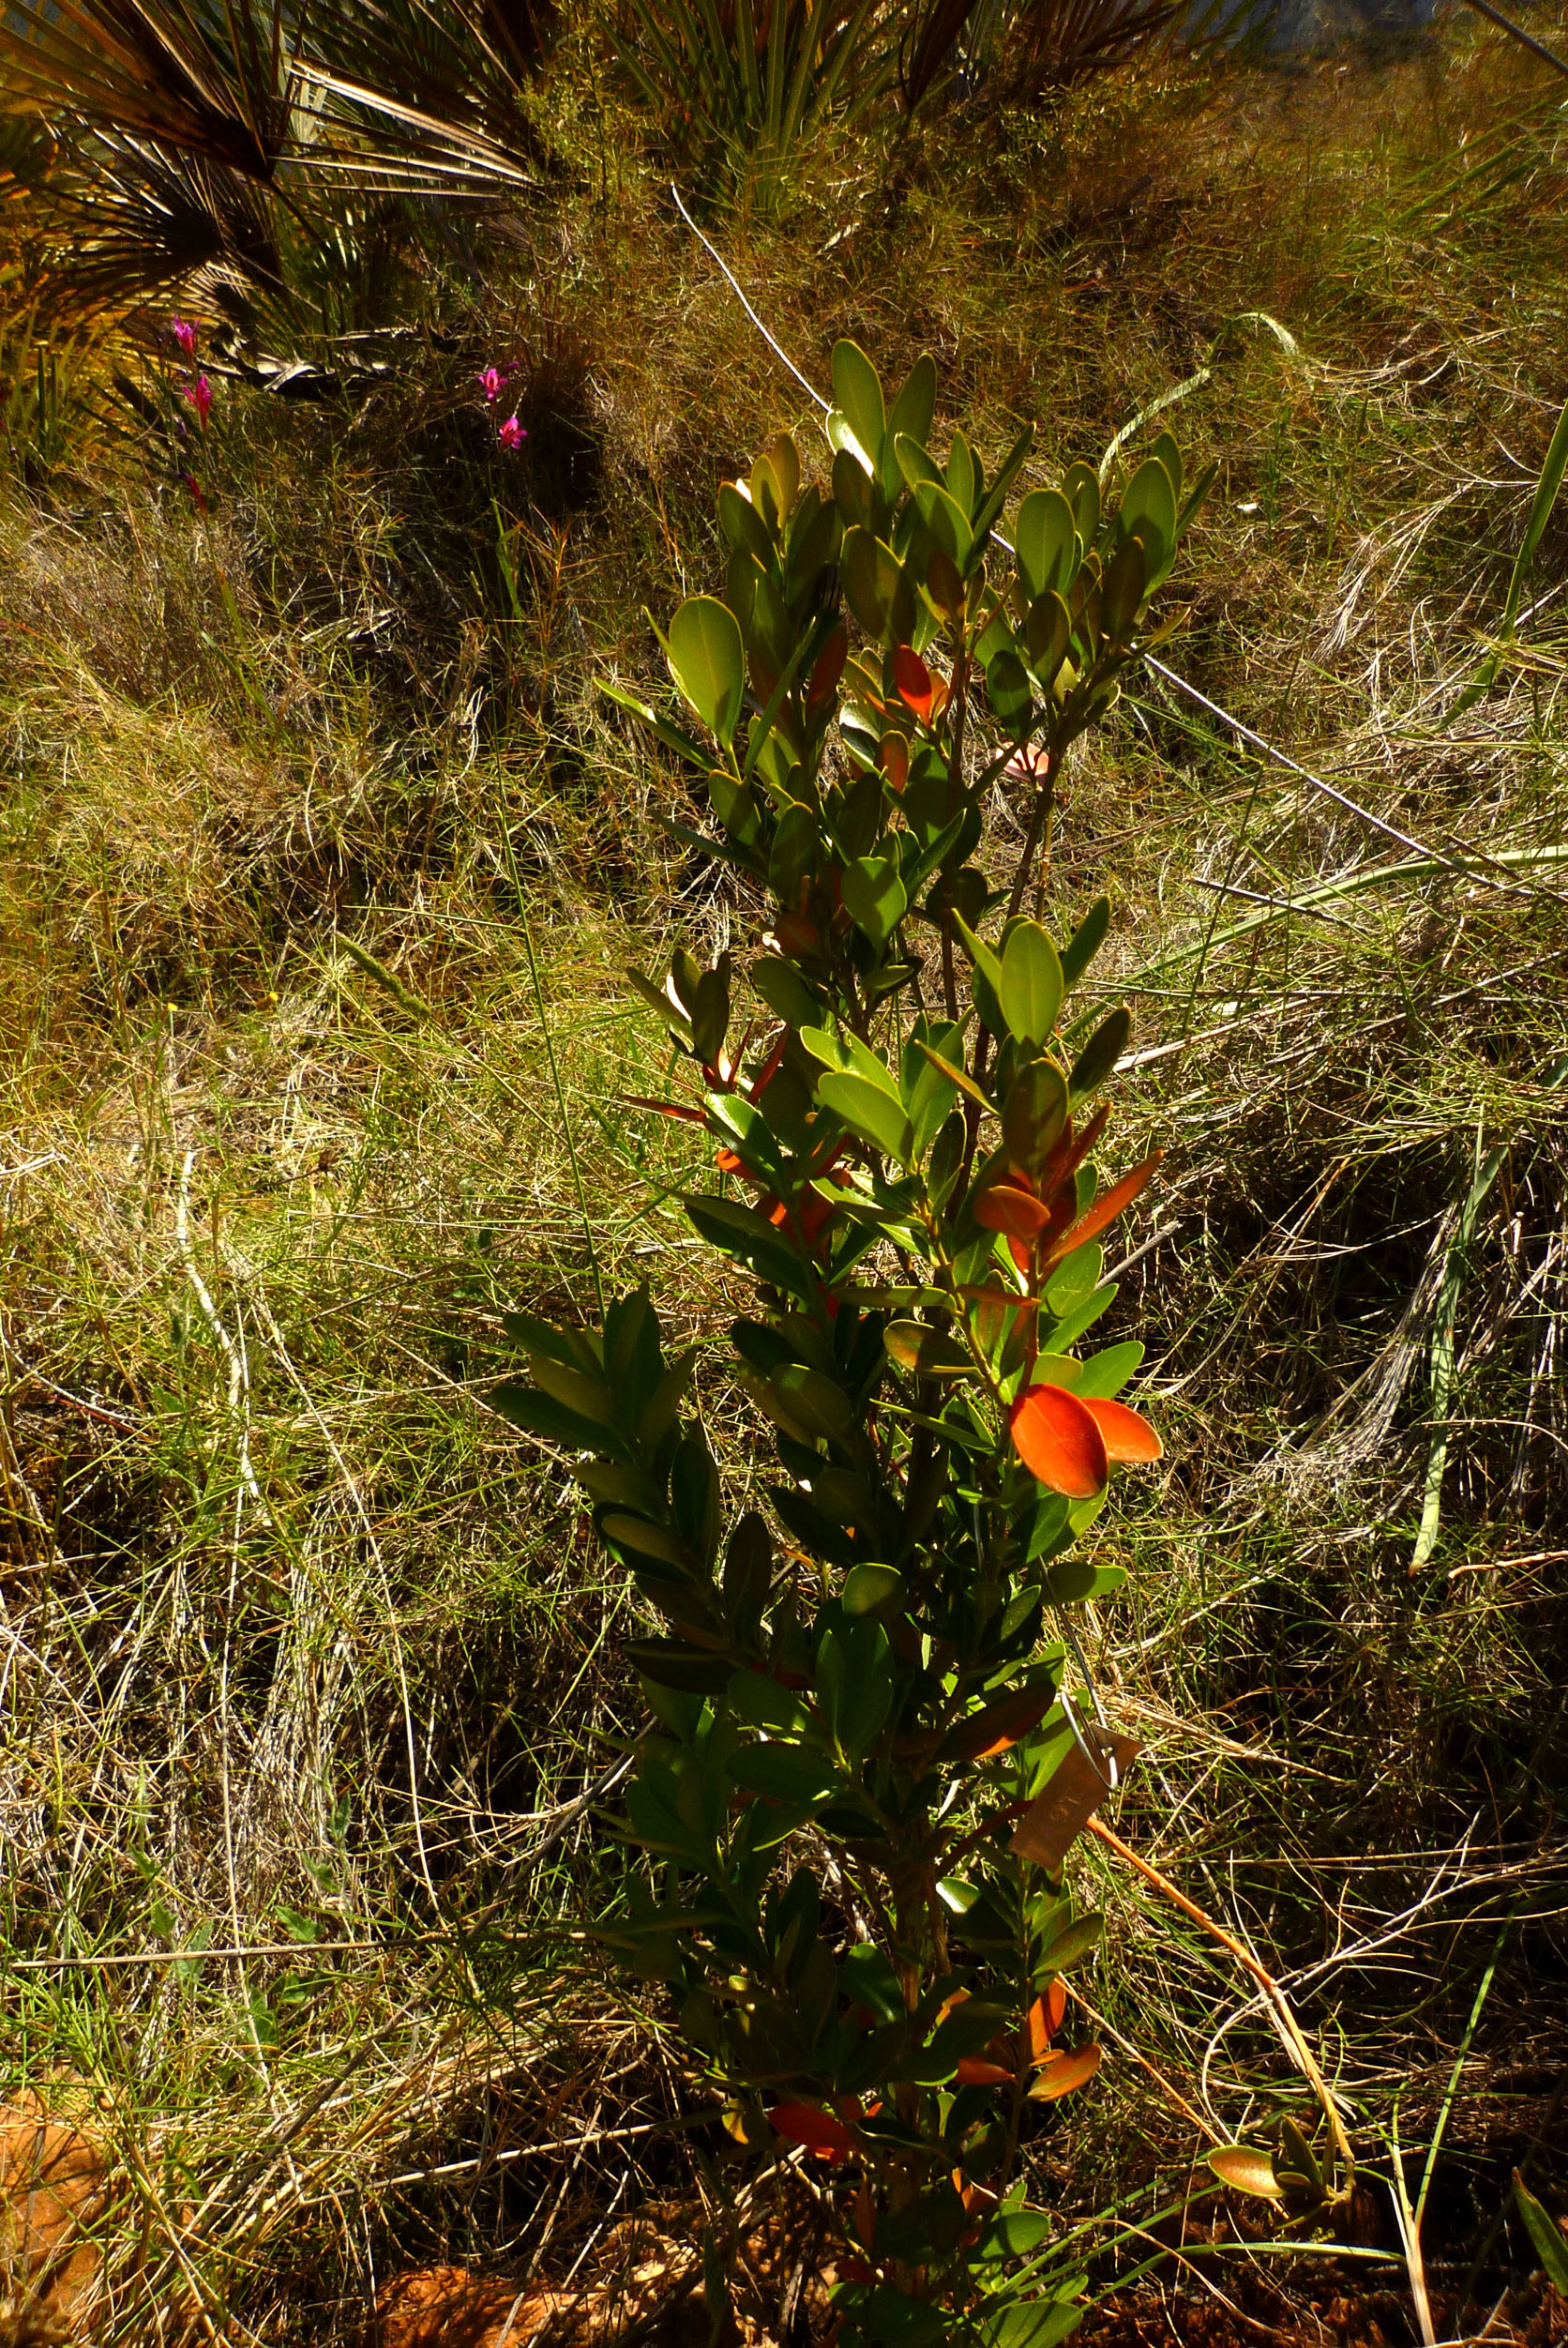 Catálogo de flora autóctona Buxus_balearica0601